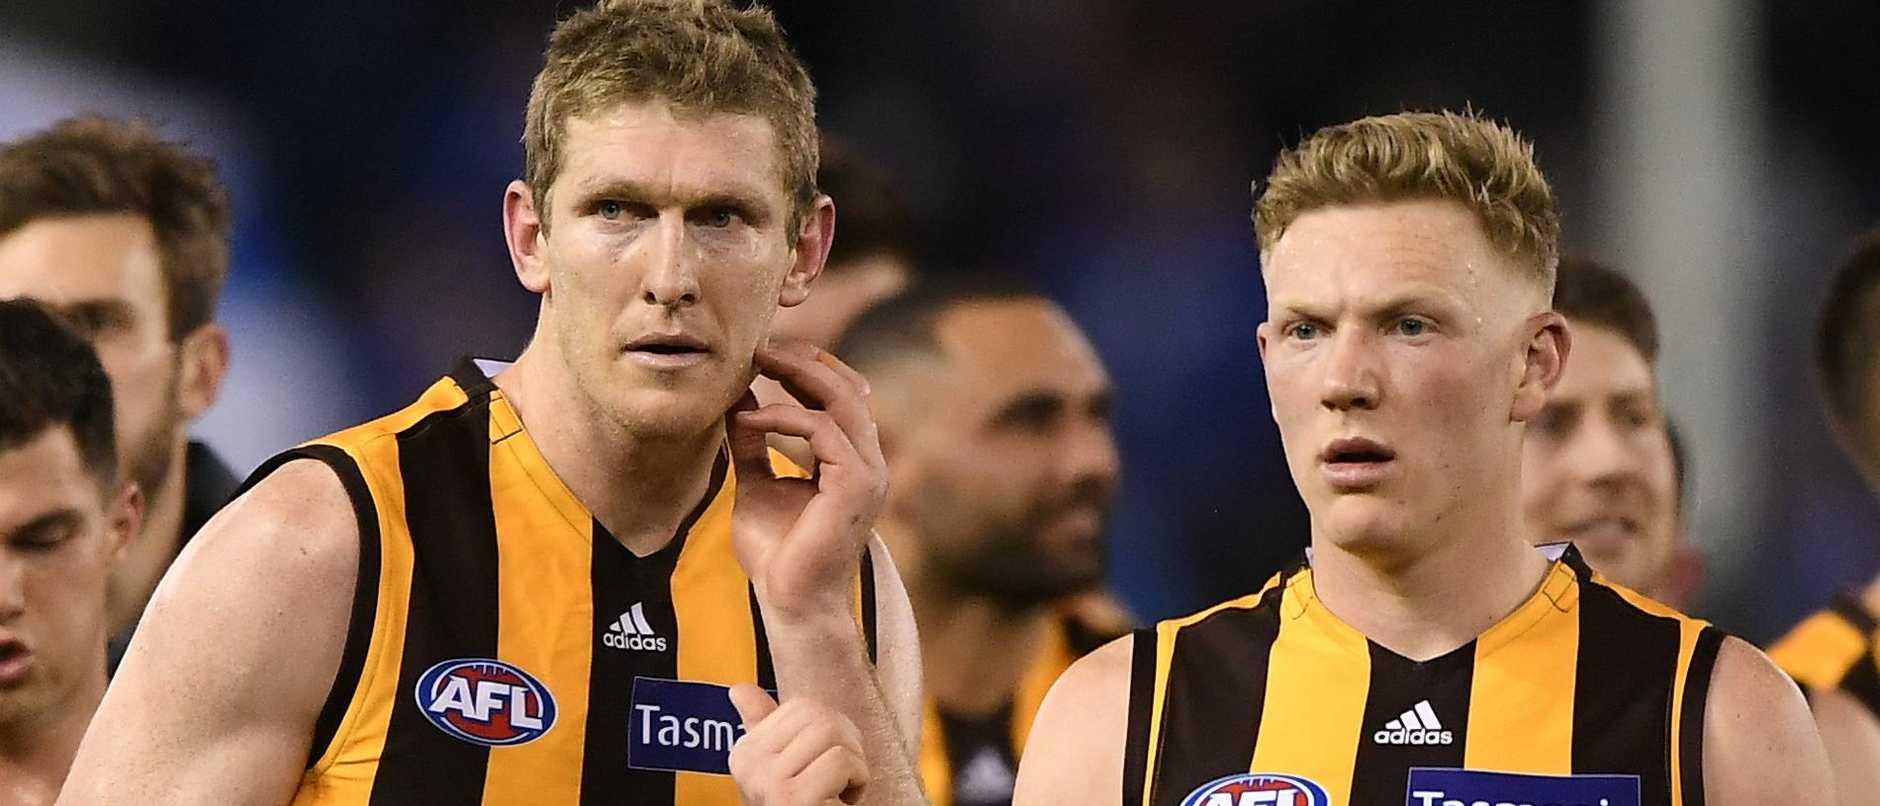 Hawthorn has announced Ben McEvoy will captain the club in 2021